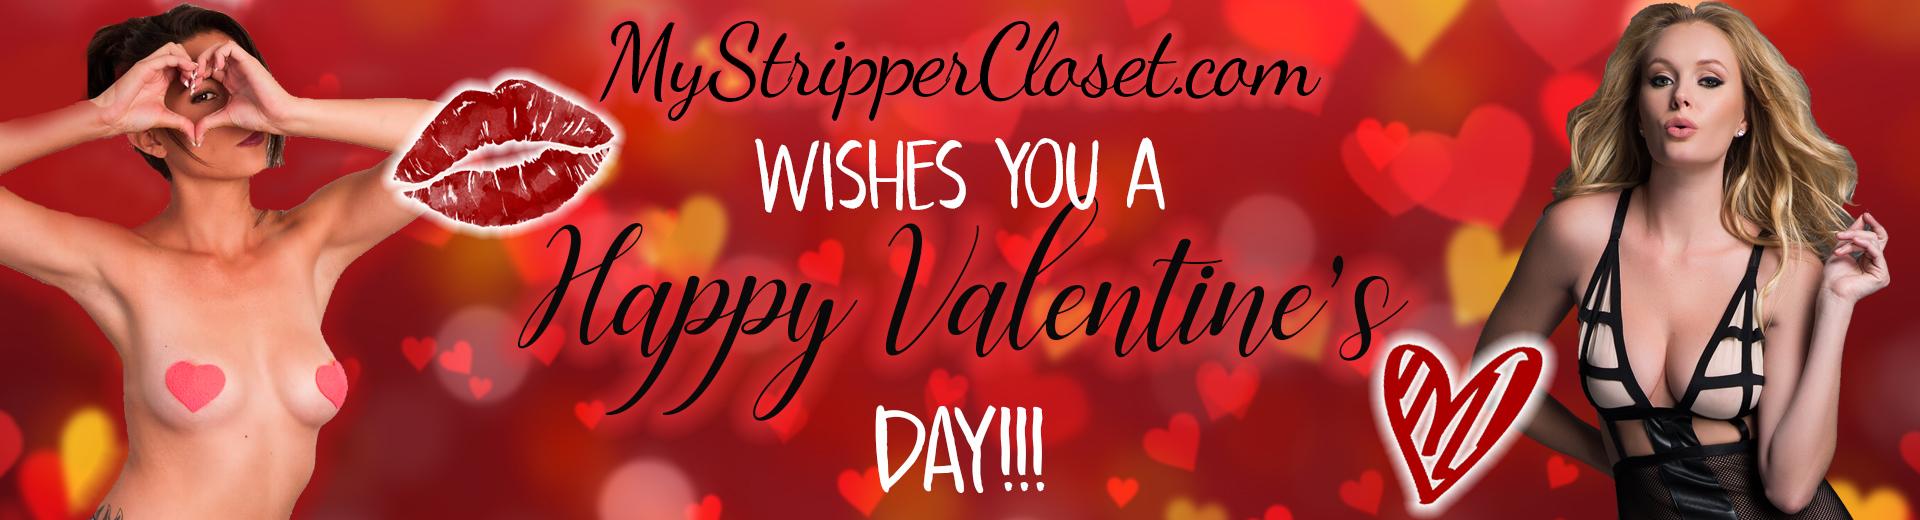 Happy Valentines Day MyStripperCloset.com